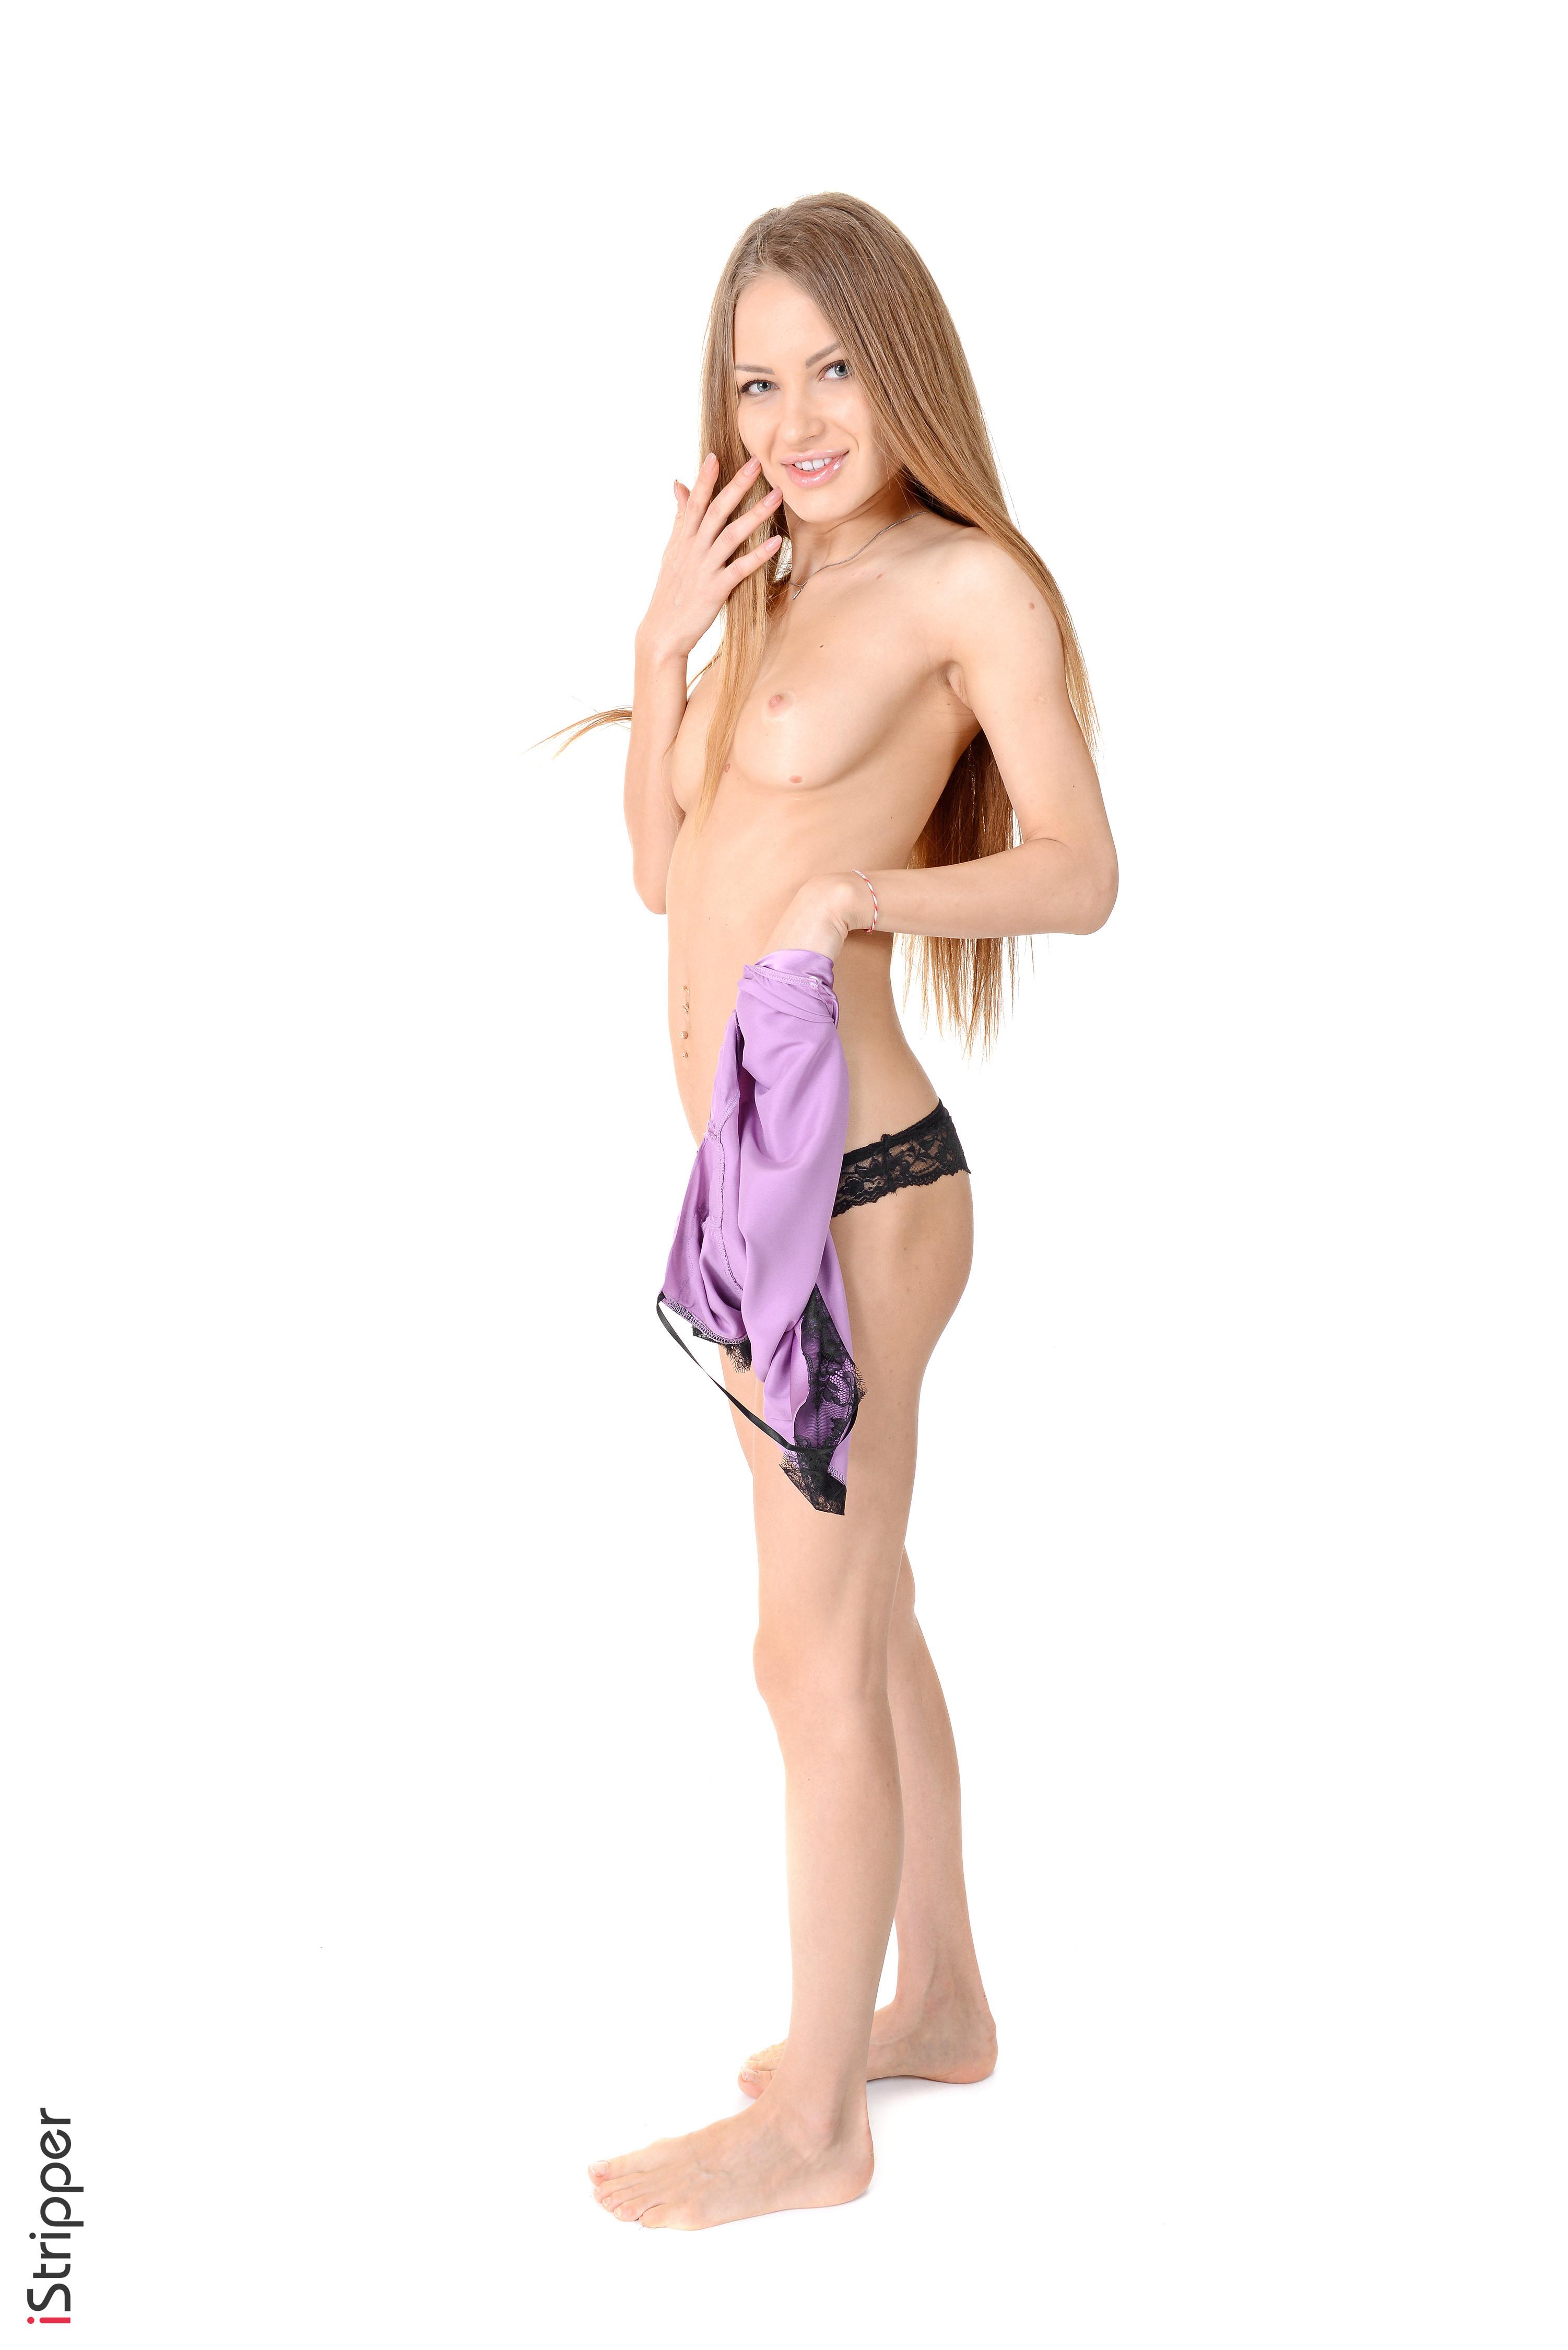 stripper for desktop